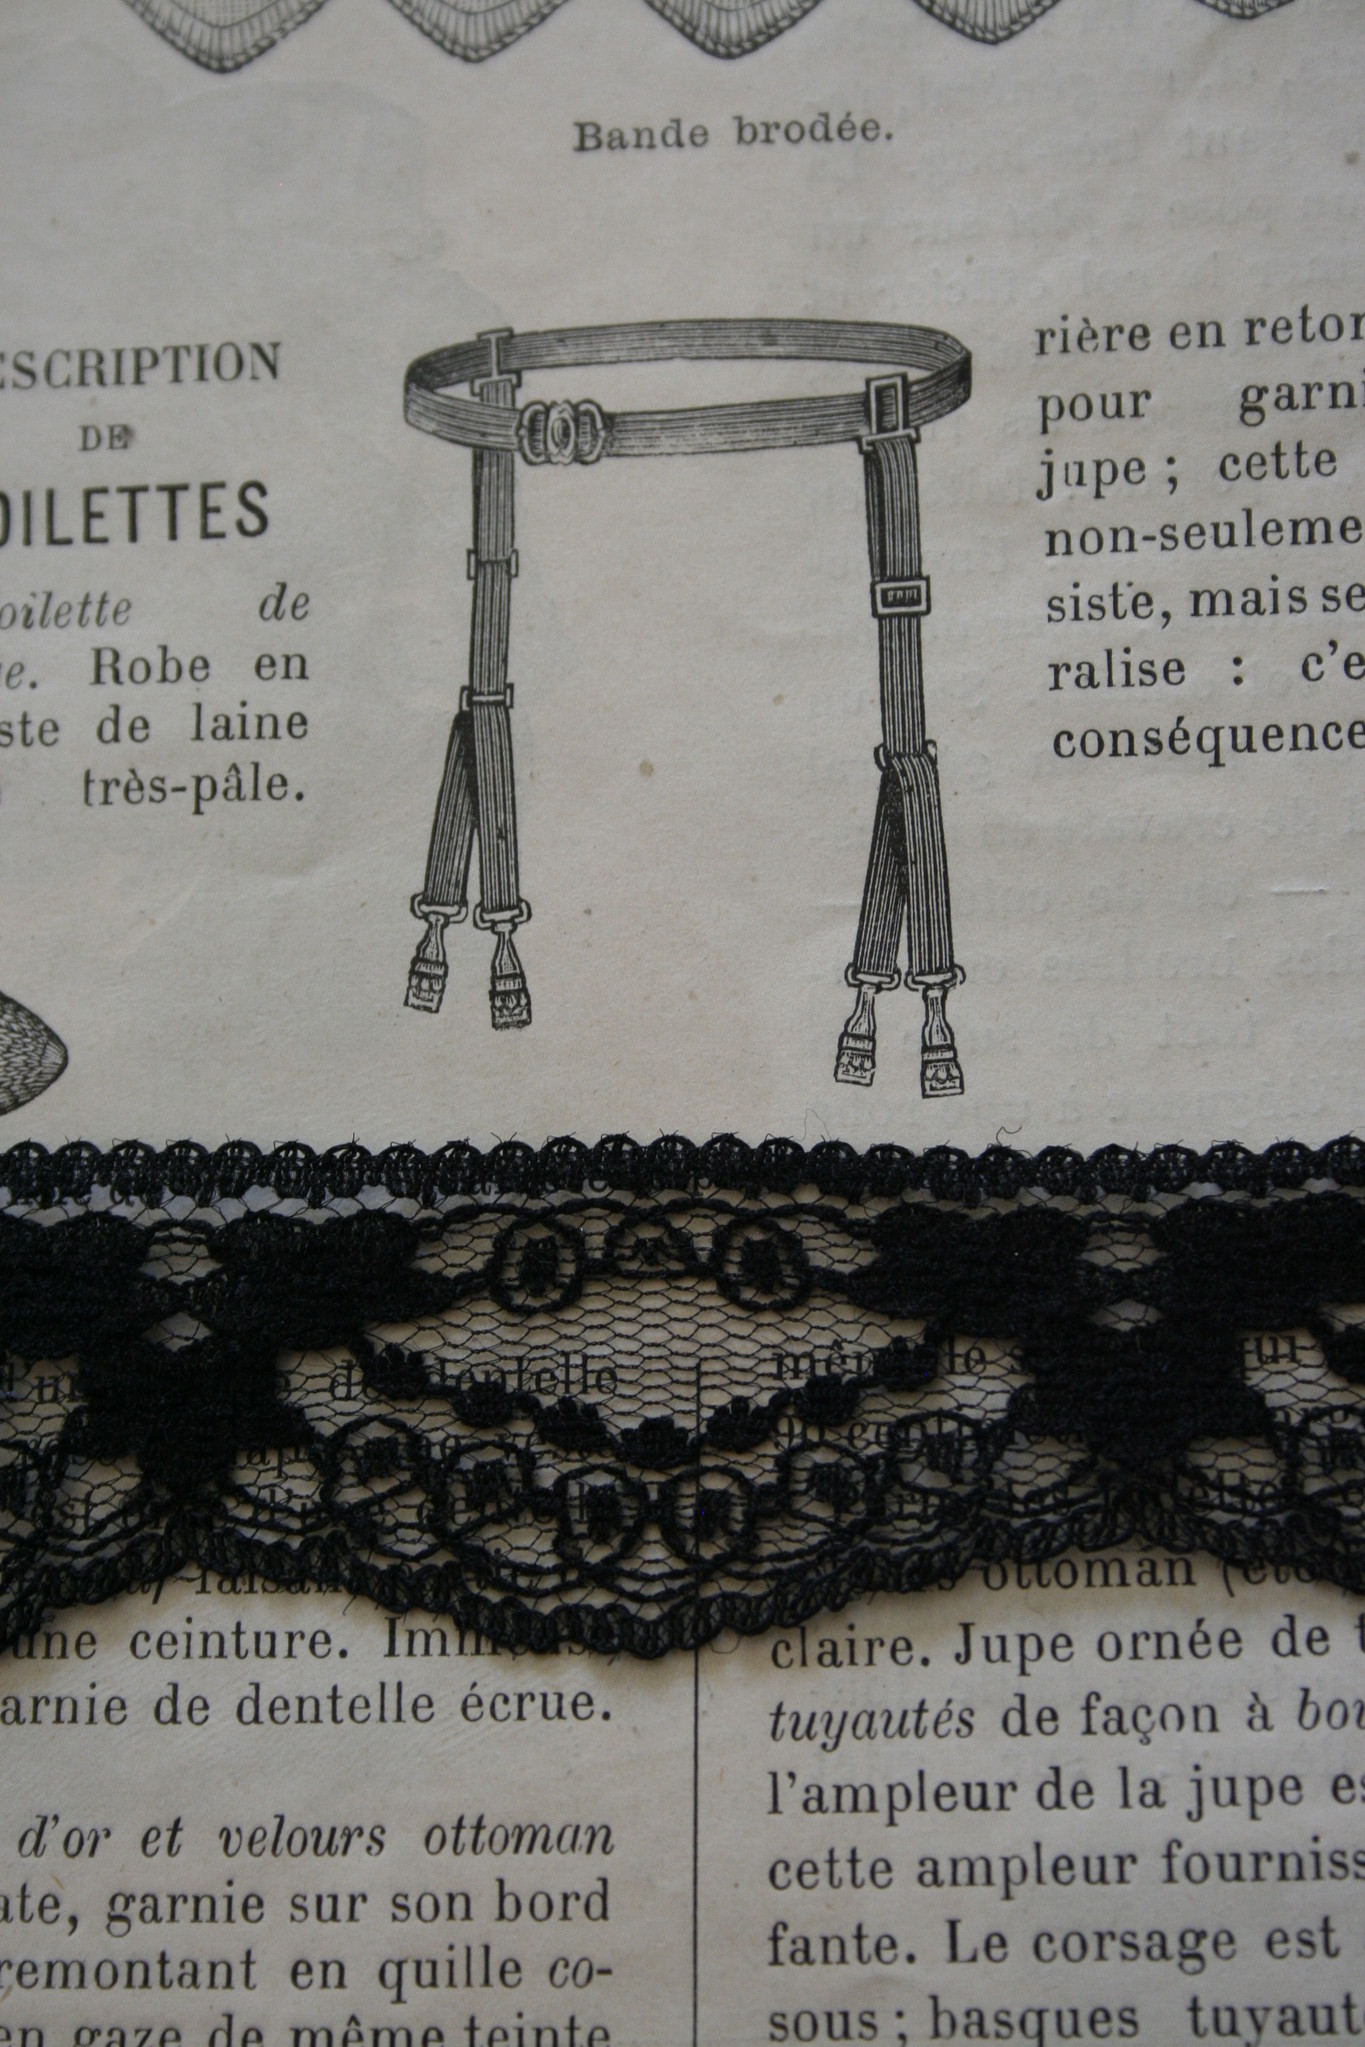 Black scalloped lace.